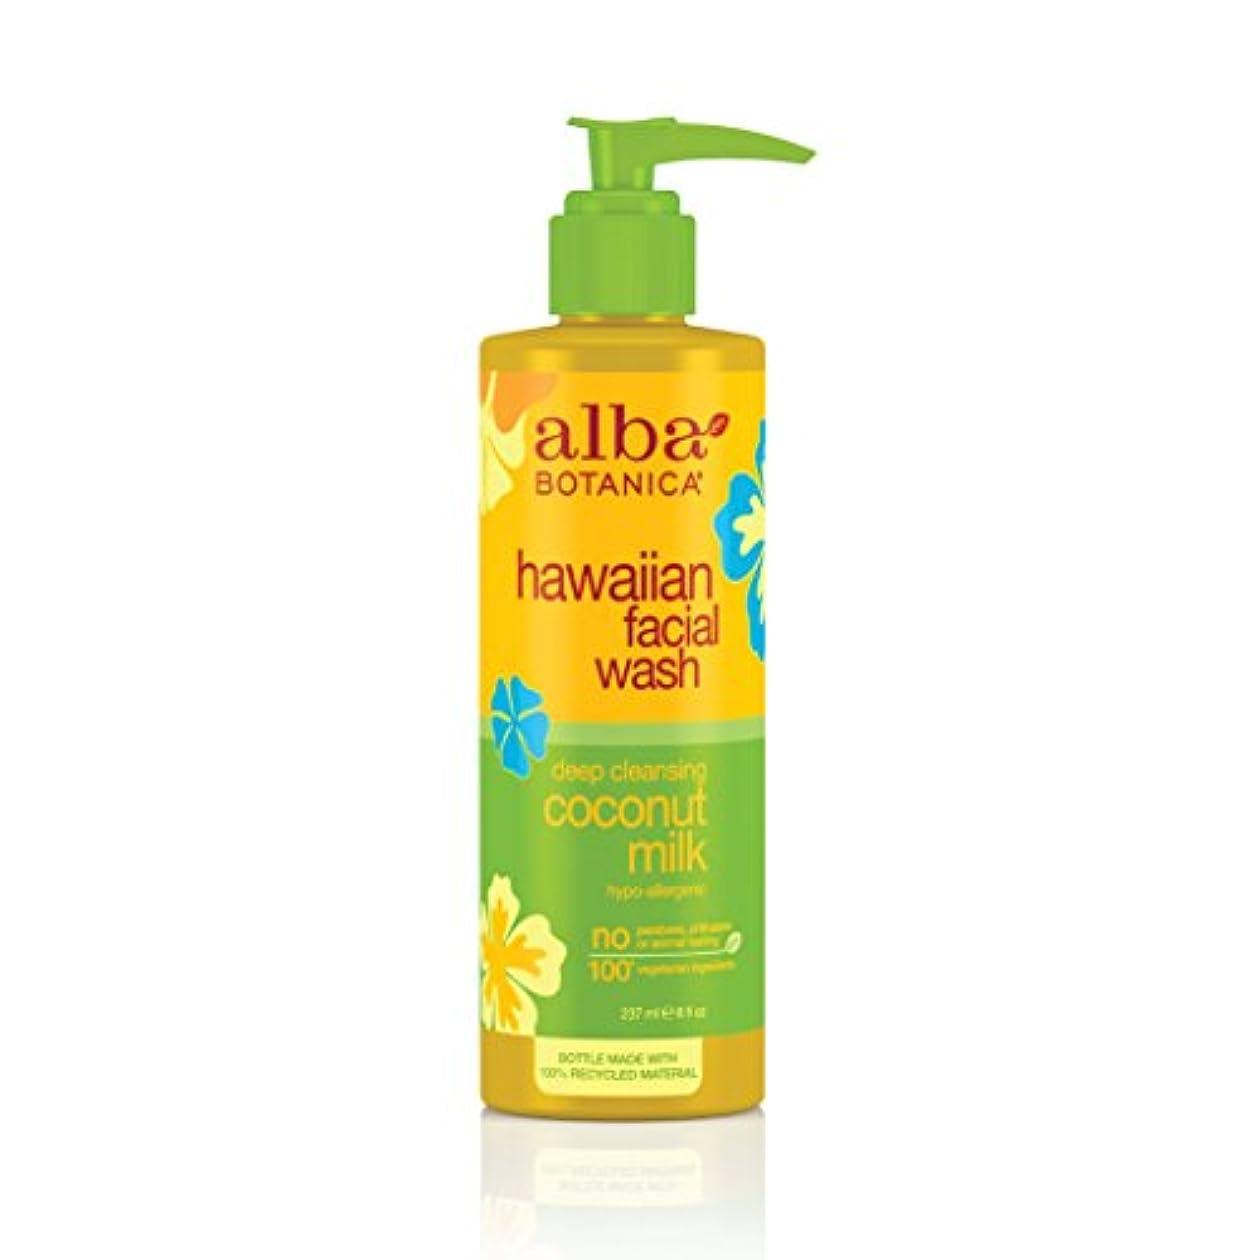 Alba Botanica Coconut Milk Facial Wash 235 ml (並行輸入品)